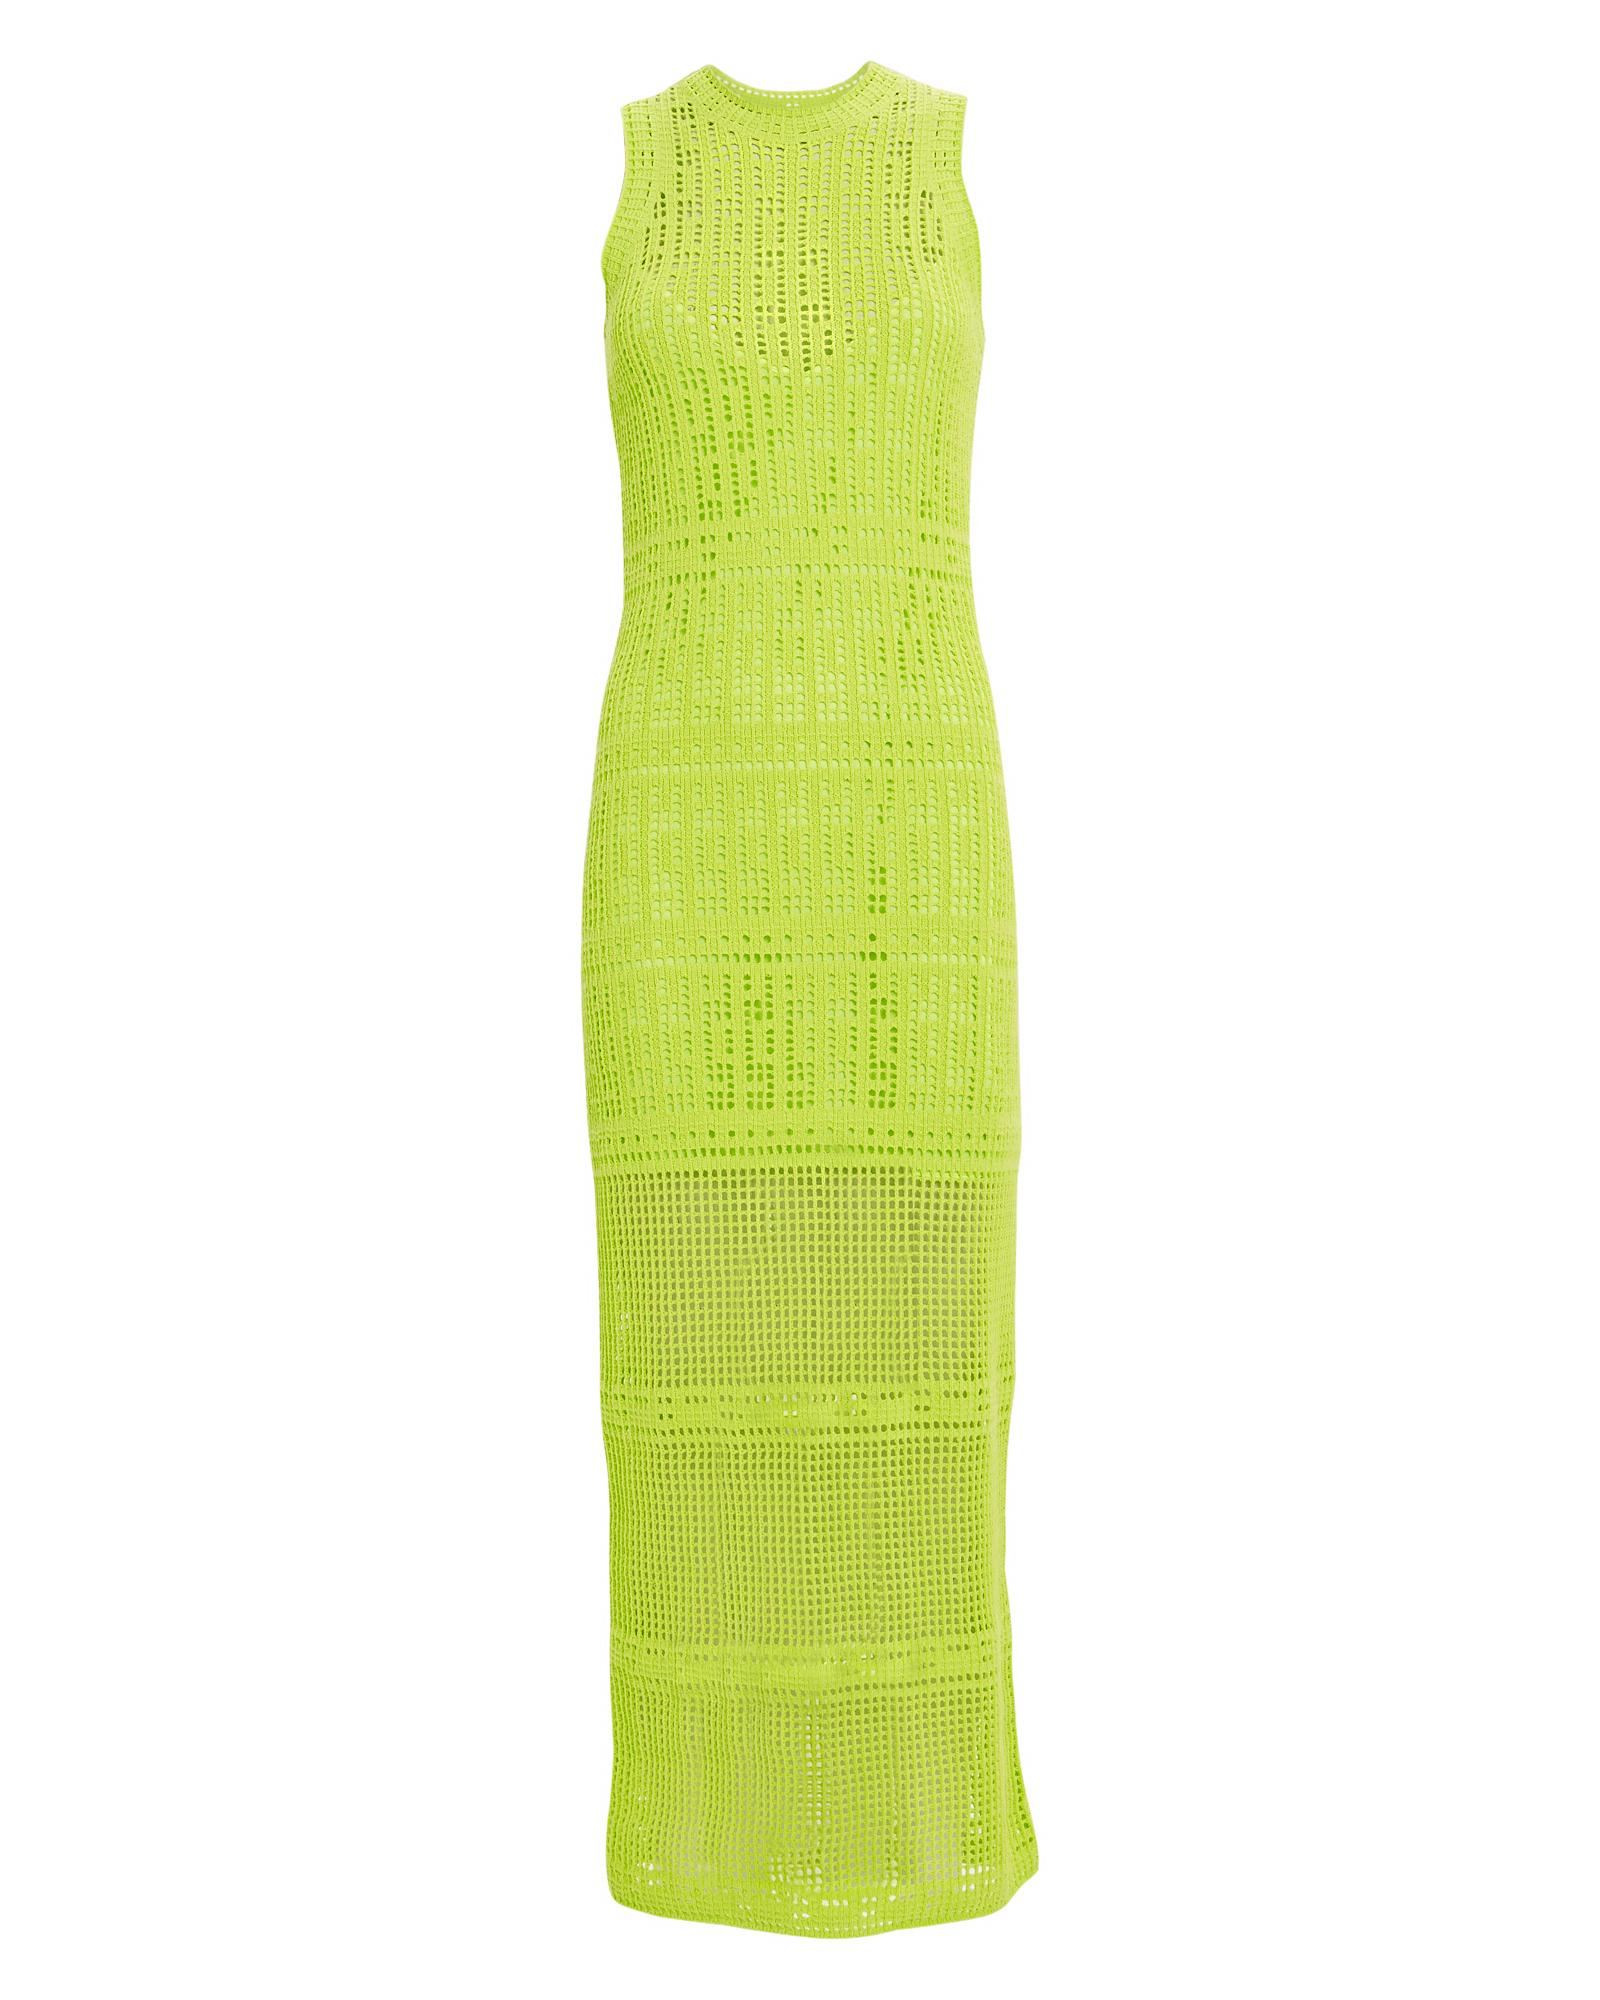 A.l.c Dresses A.L.C. MONAGHAN EYELET SHEATH DRESS  YELLOW XL